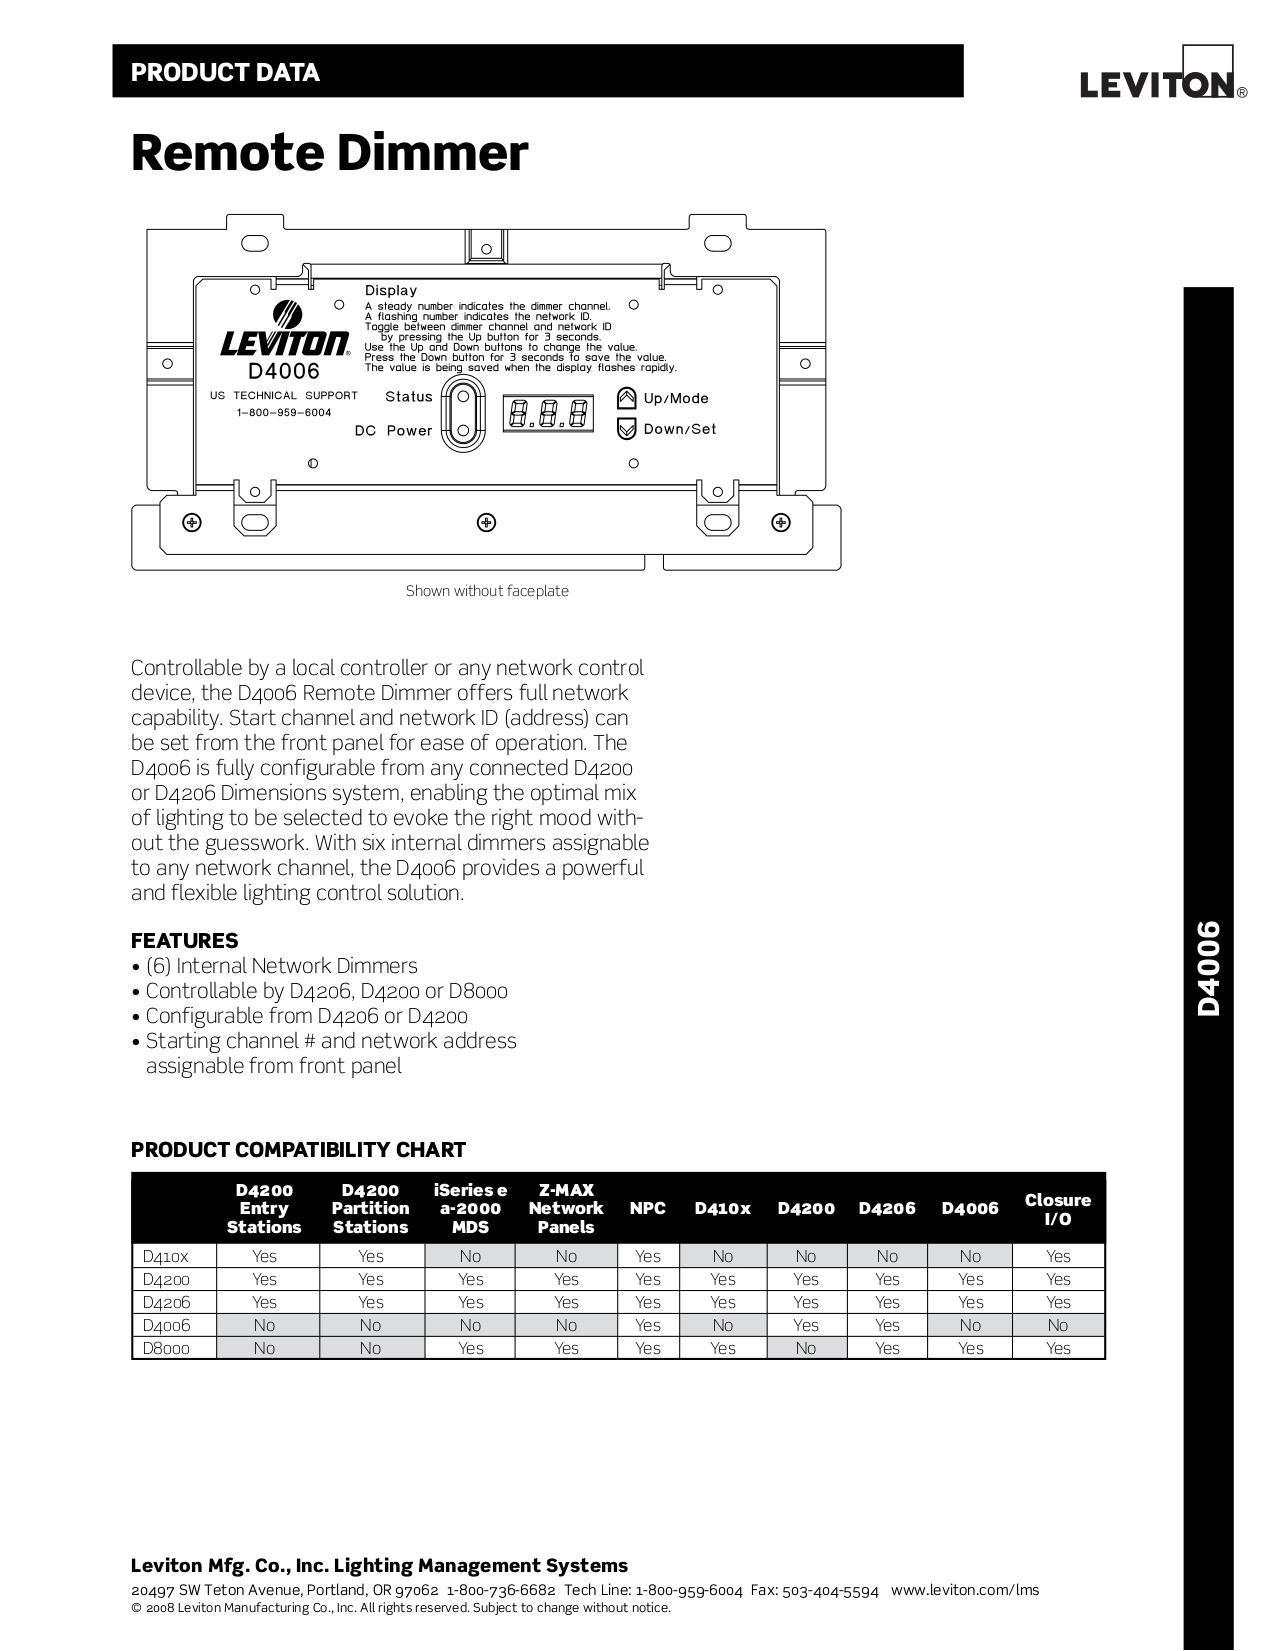 Colorful Leviton Lighting Controls Manual Illustration - Electrical ...